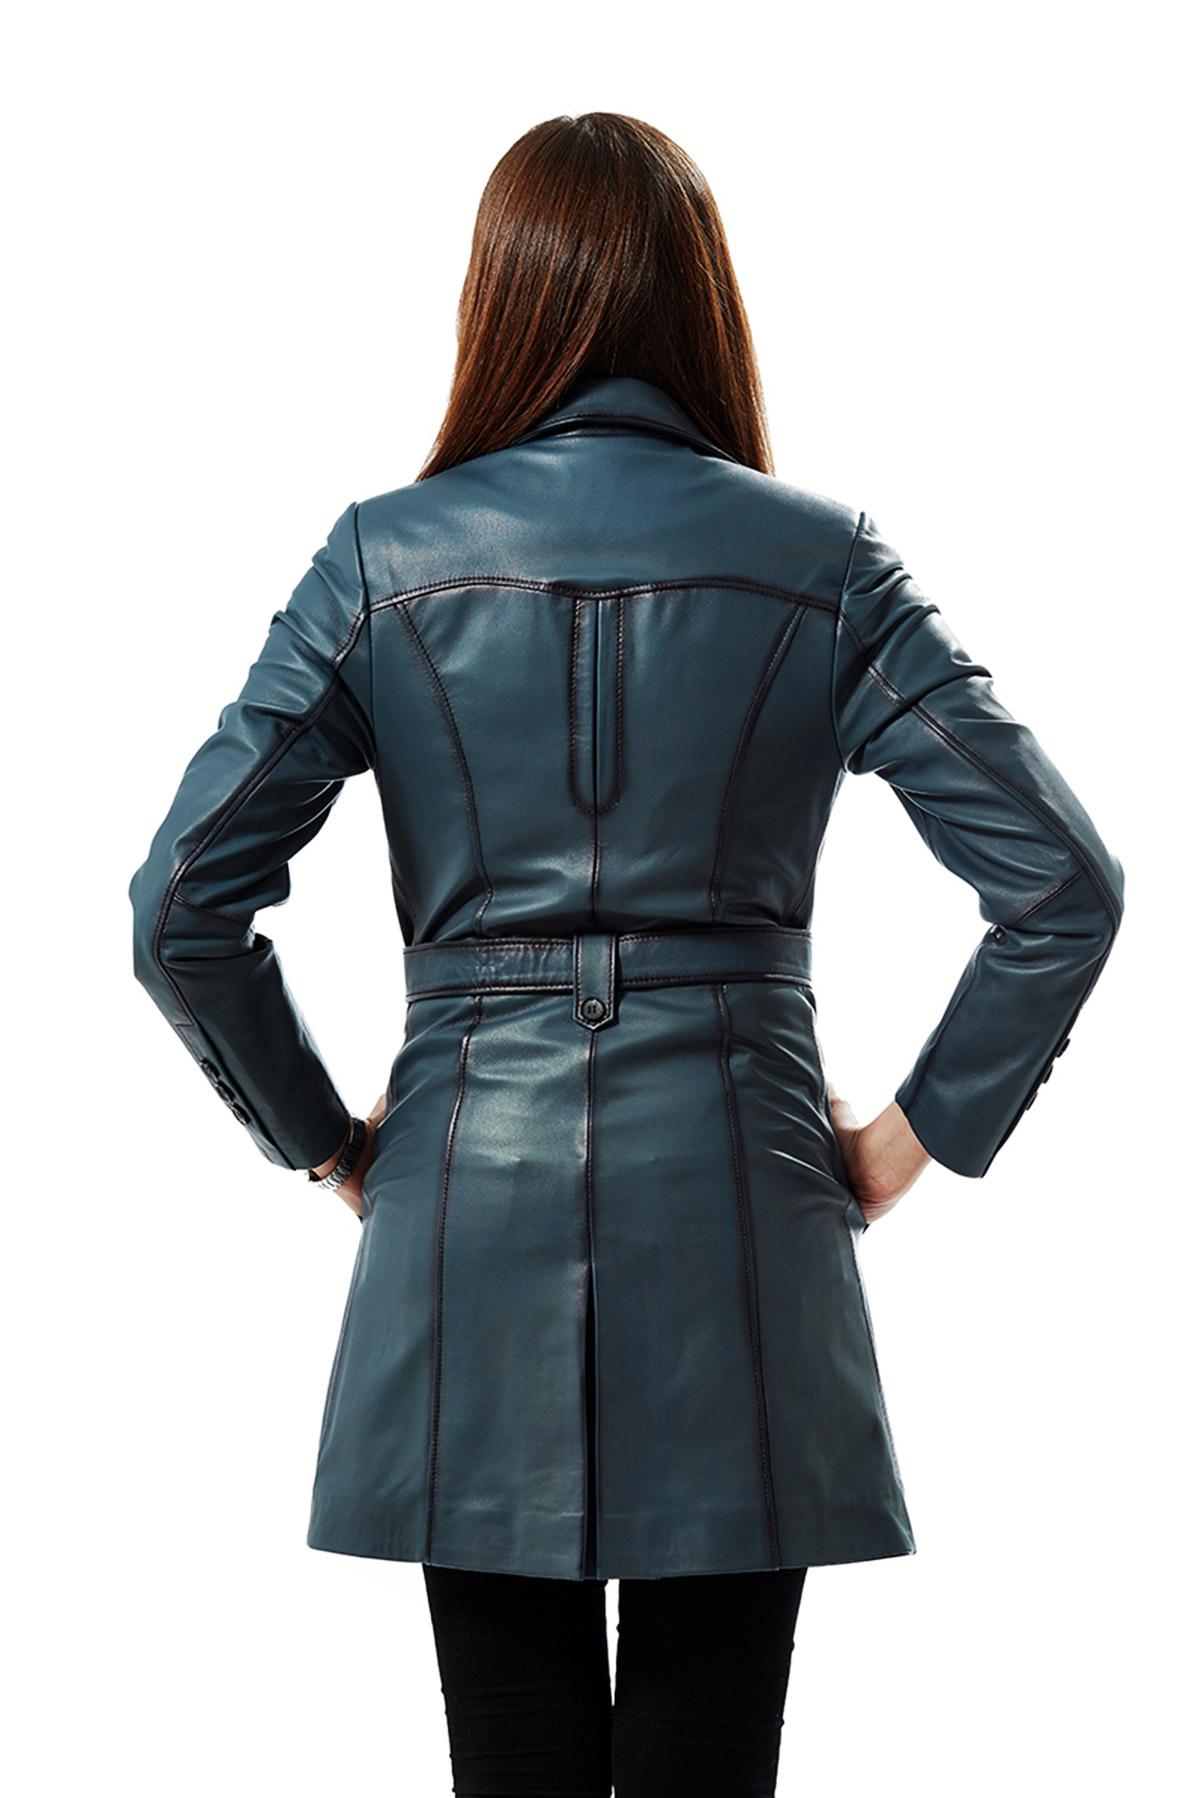 women's blue leather jacket